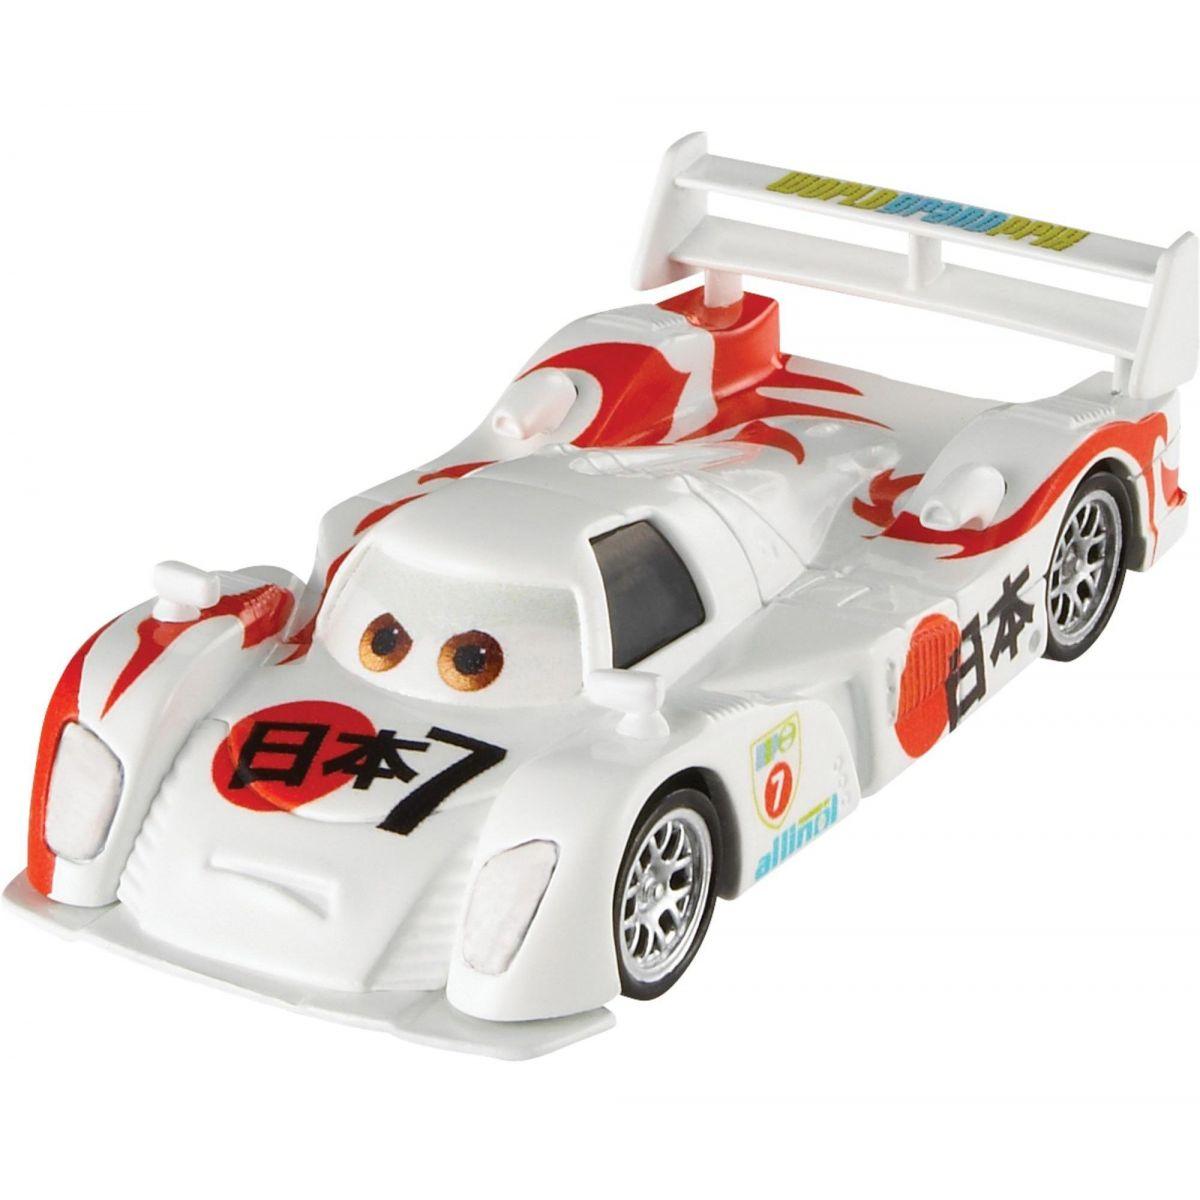 Mattel Cars 3 Autá Shu Todoroki